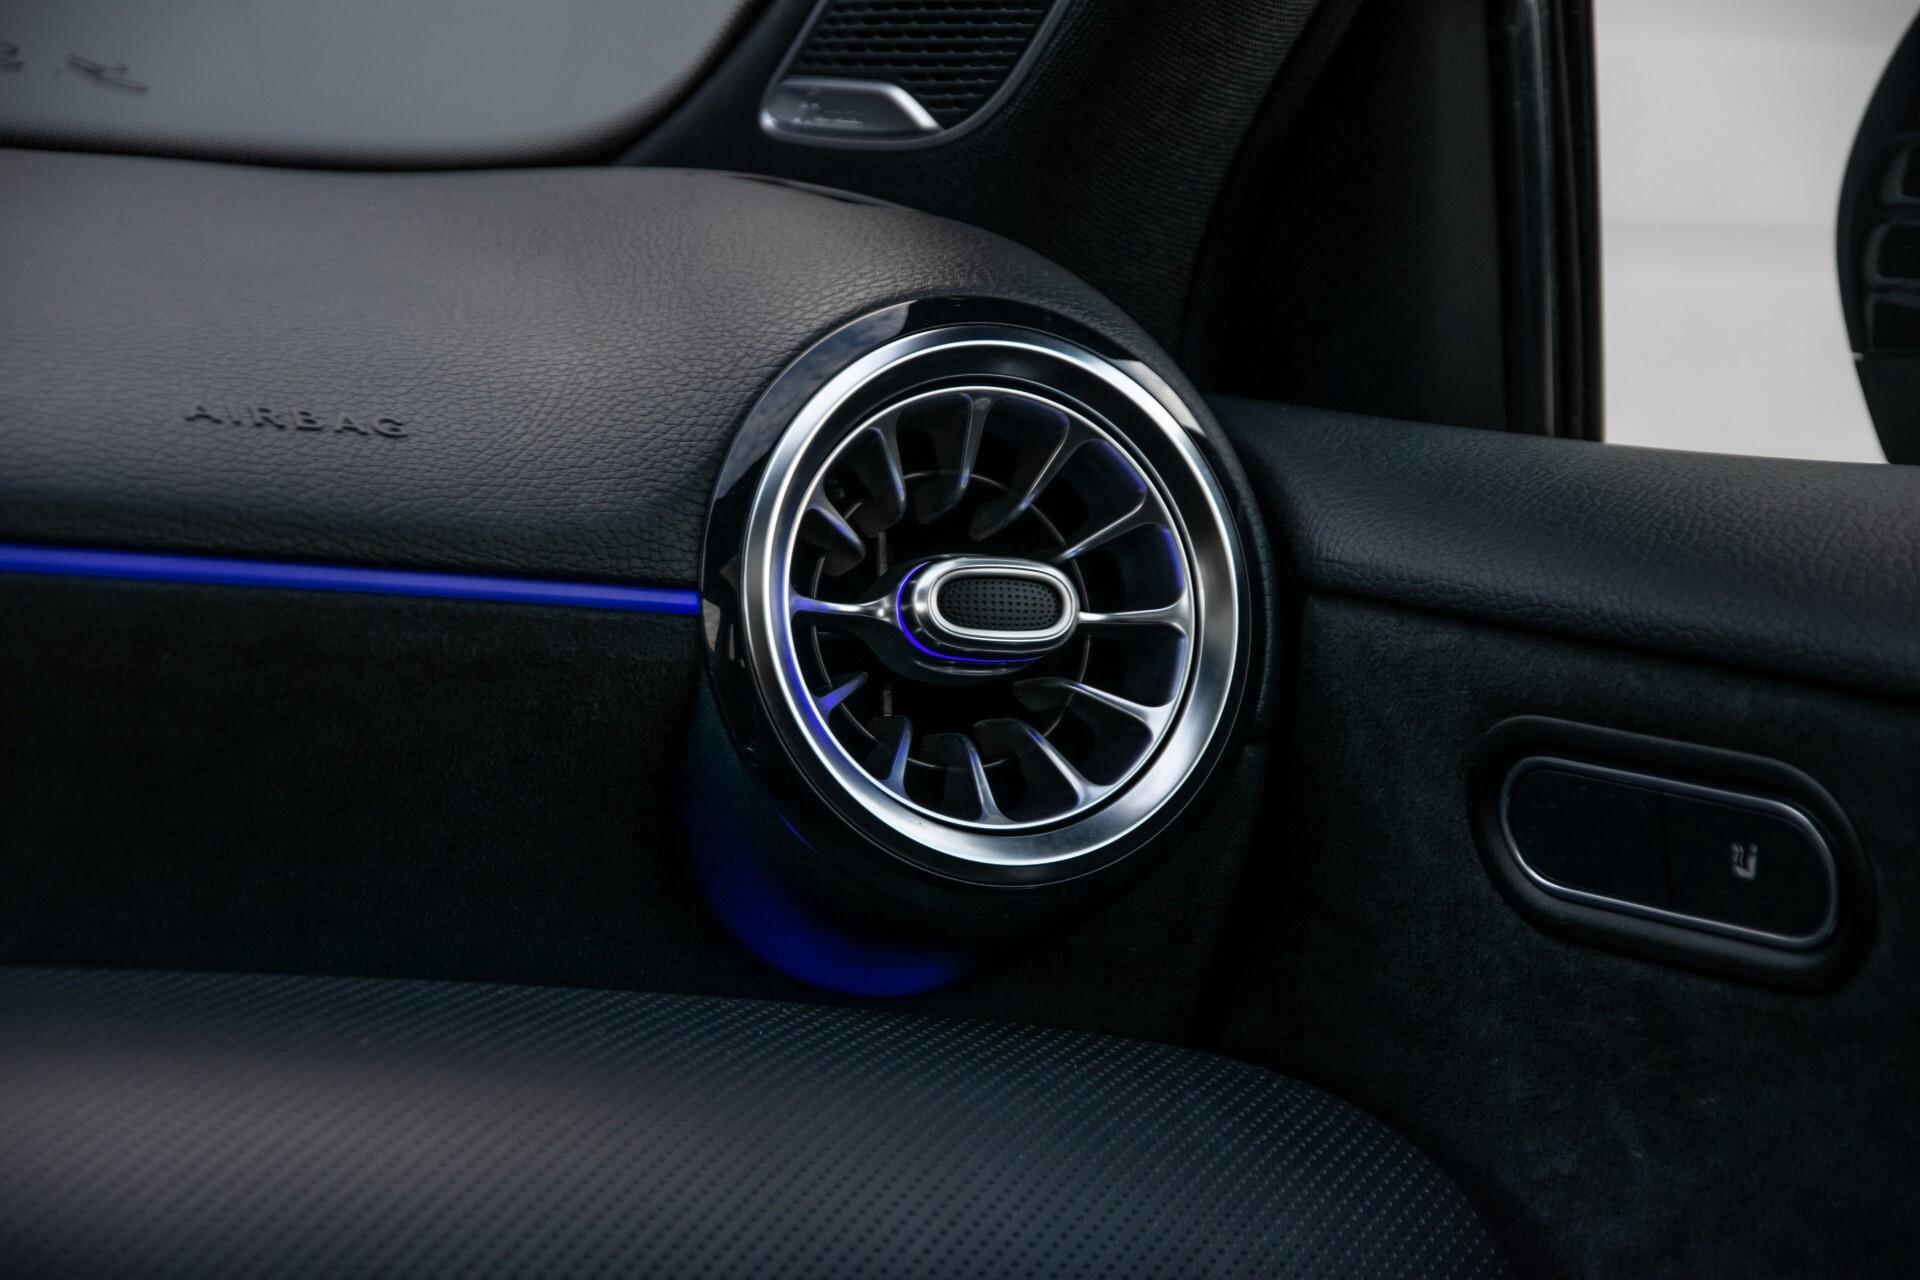 Mercedes-Benz A-Klasse 250 4-M AMG Panorama/Keyless-Entry/MBUX/HUD/Burmester/360/Multibeam LED Aut7 Foto 48